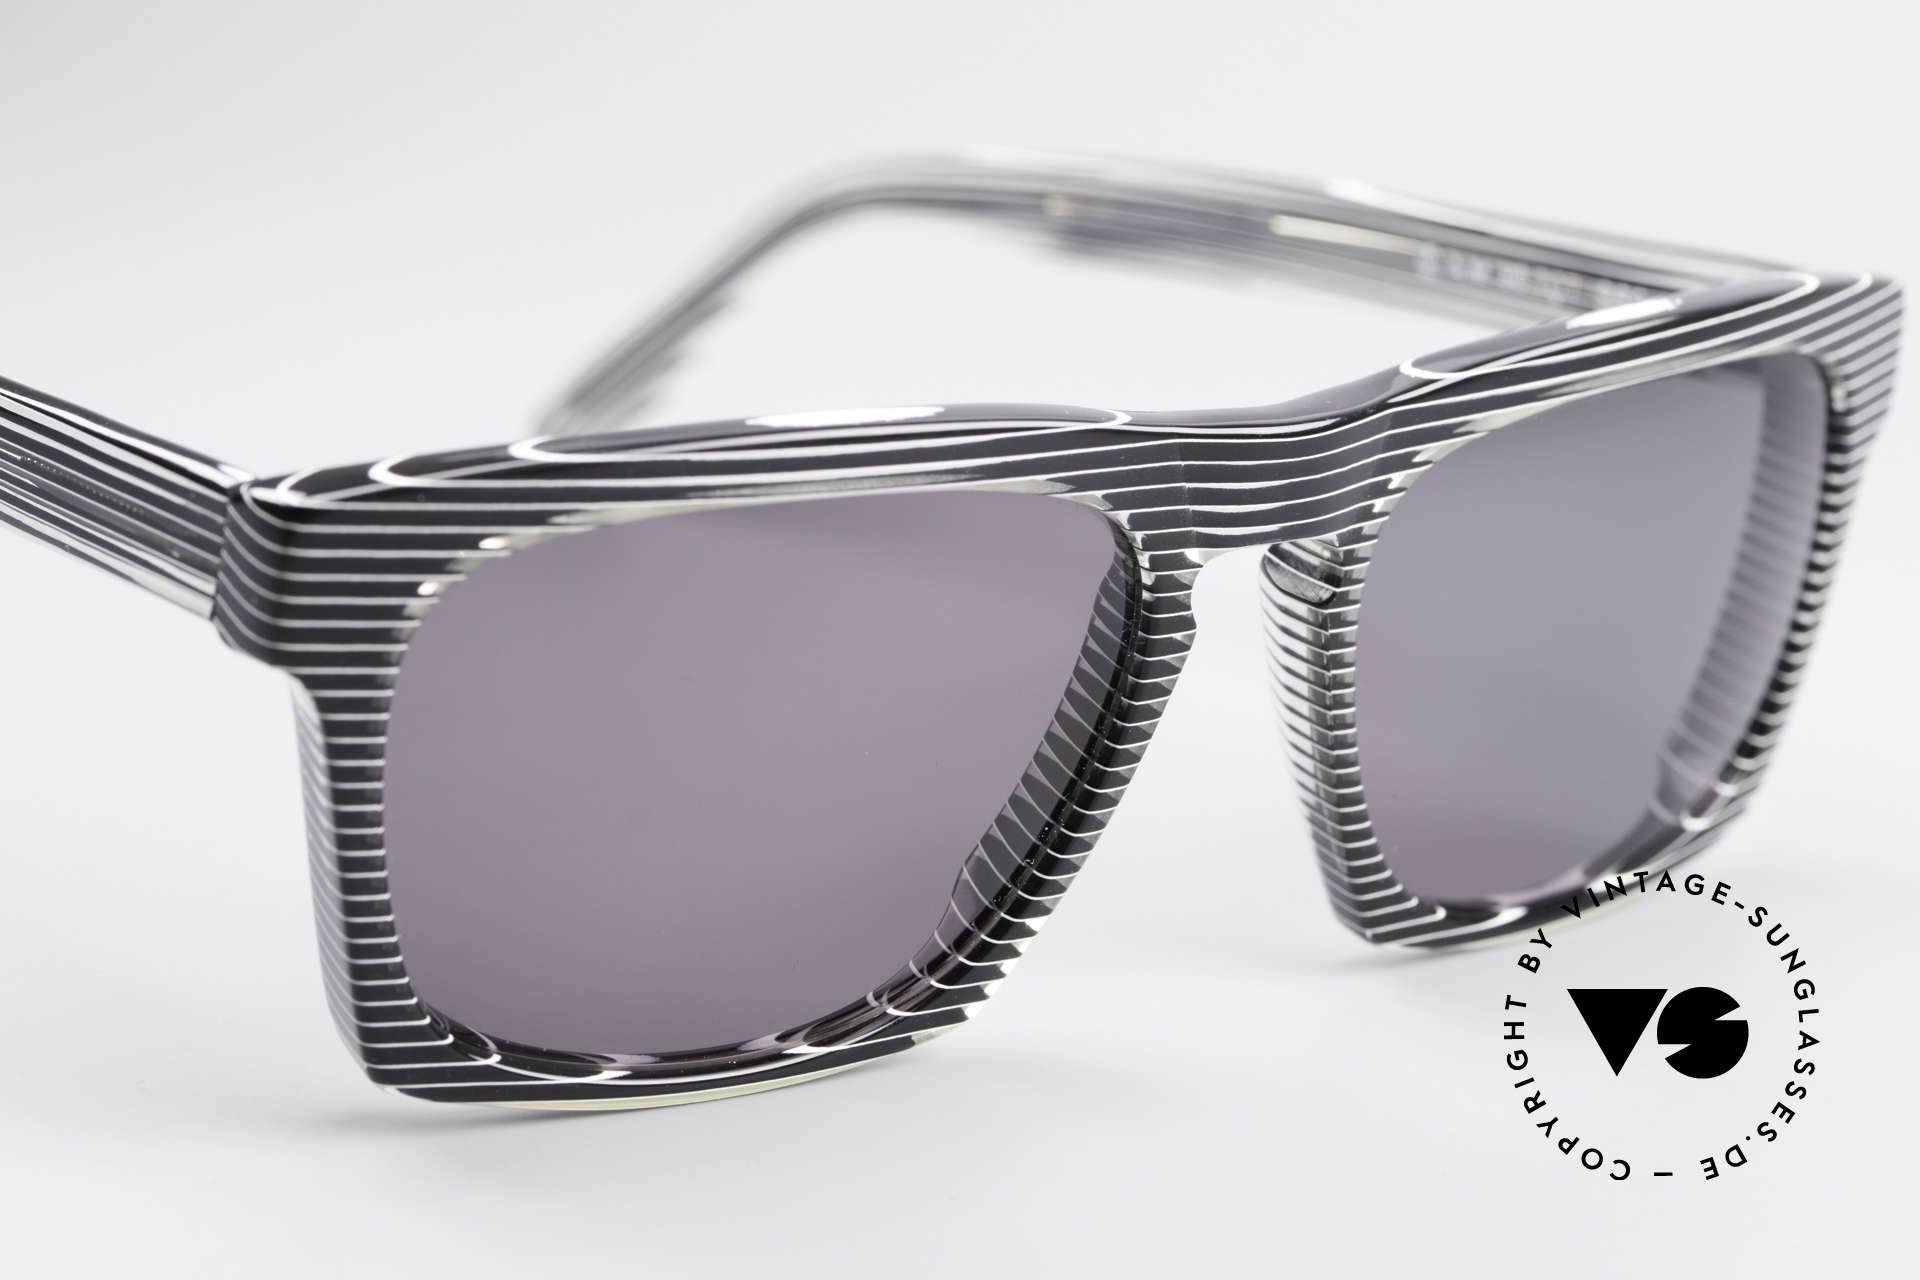 Alain Mikli 707 / 986 Unique Designer Sunglasses, NO retro specs, but a precious 30 years old ORIGINAL, Made for Men and Women